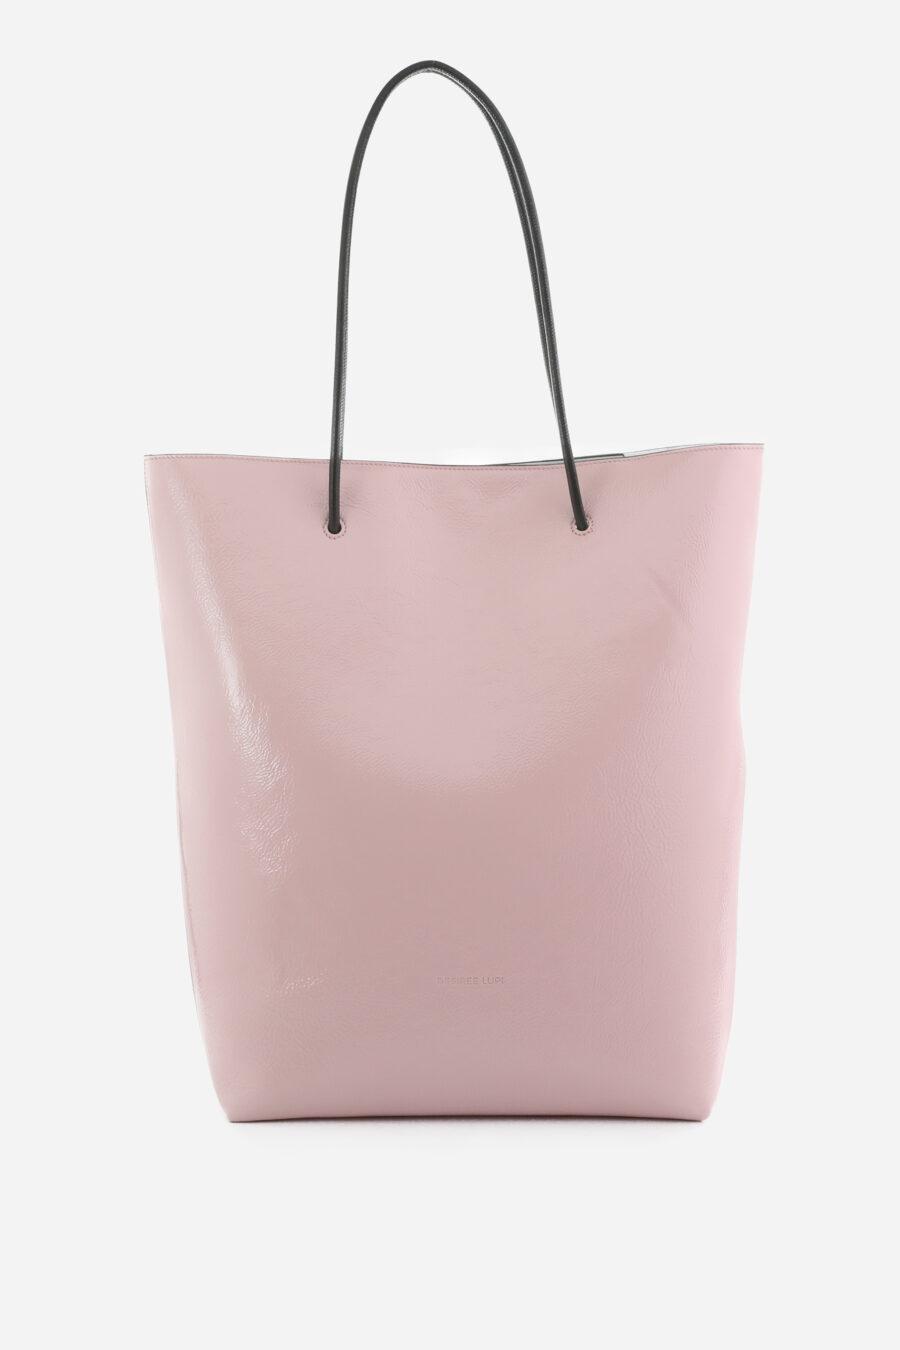 SHOPPING-BAG-KELLY-VERNICE-ROSA_1